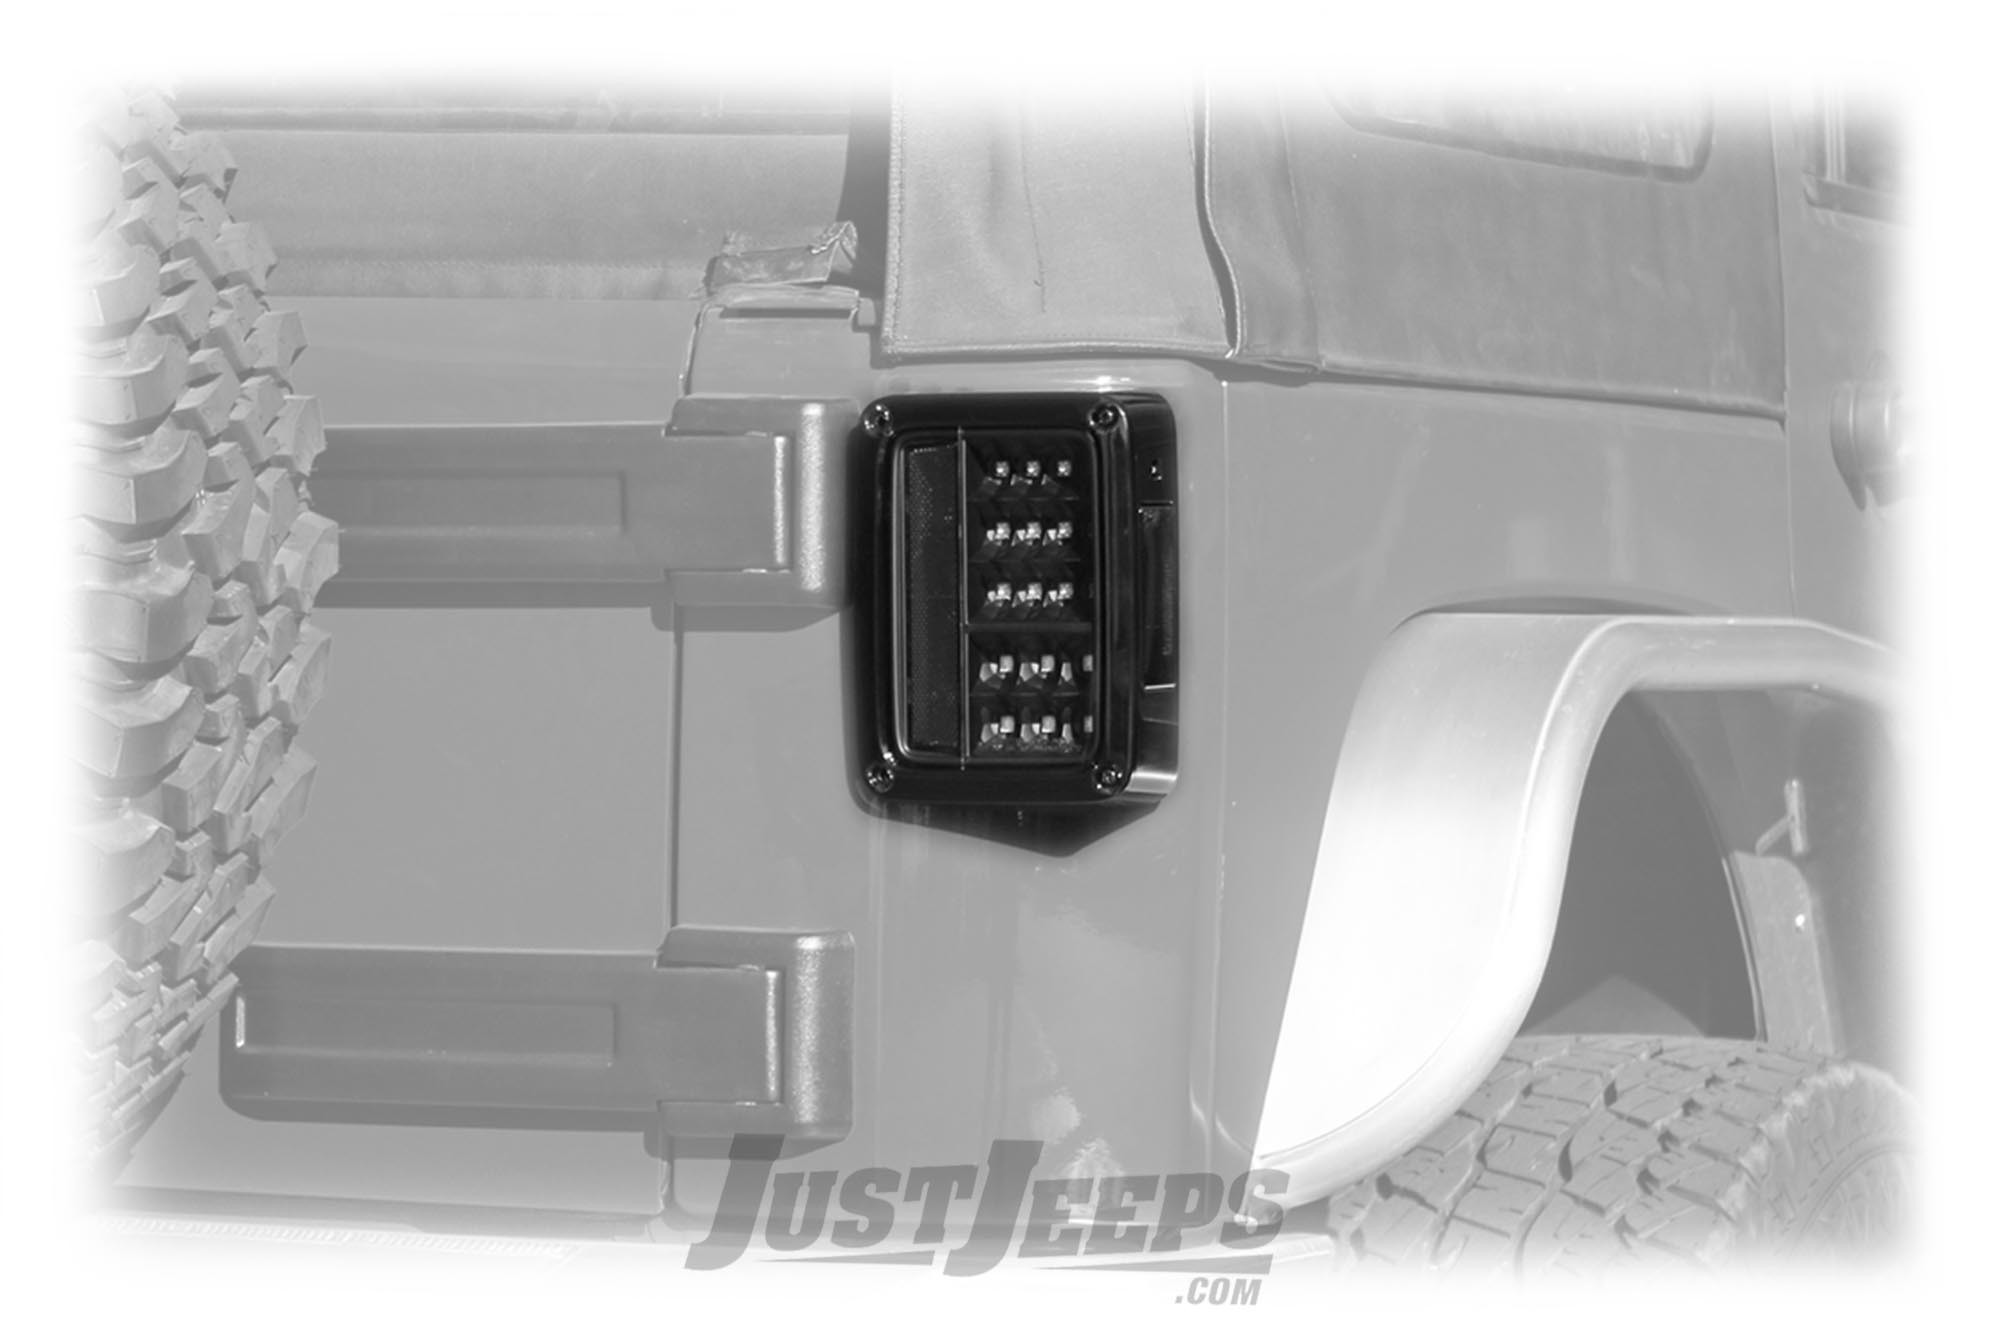 Spyder Automotive LED Tail Lights (Pair) For 2007-18 Jeep Wrangler 2 Door & Unlimited 4 Door Models